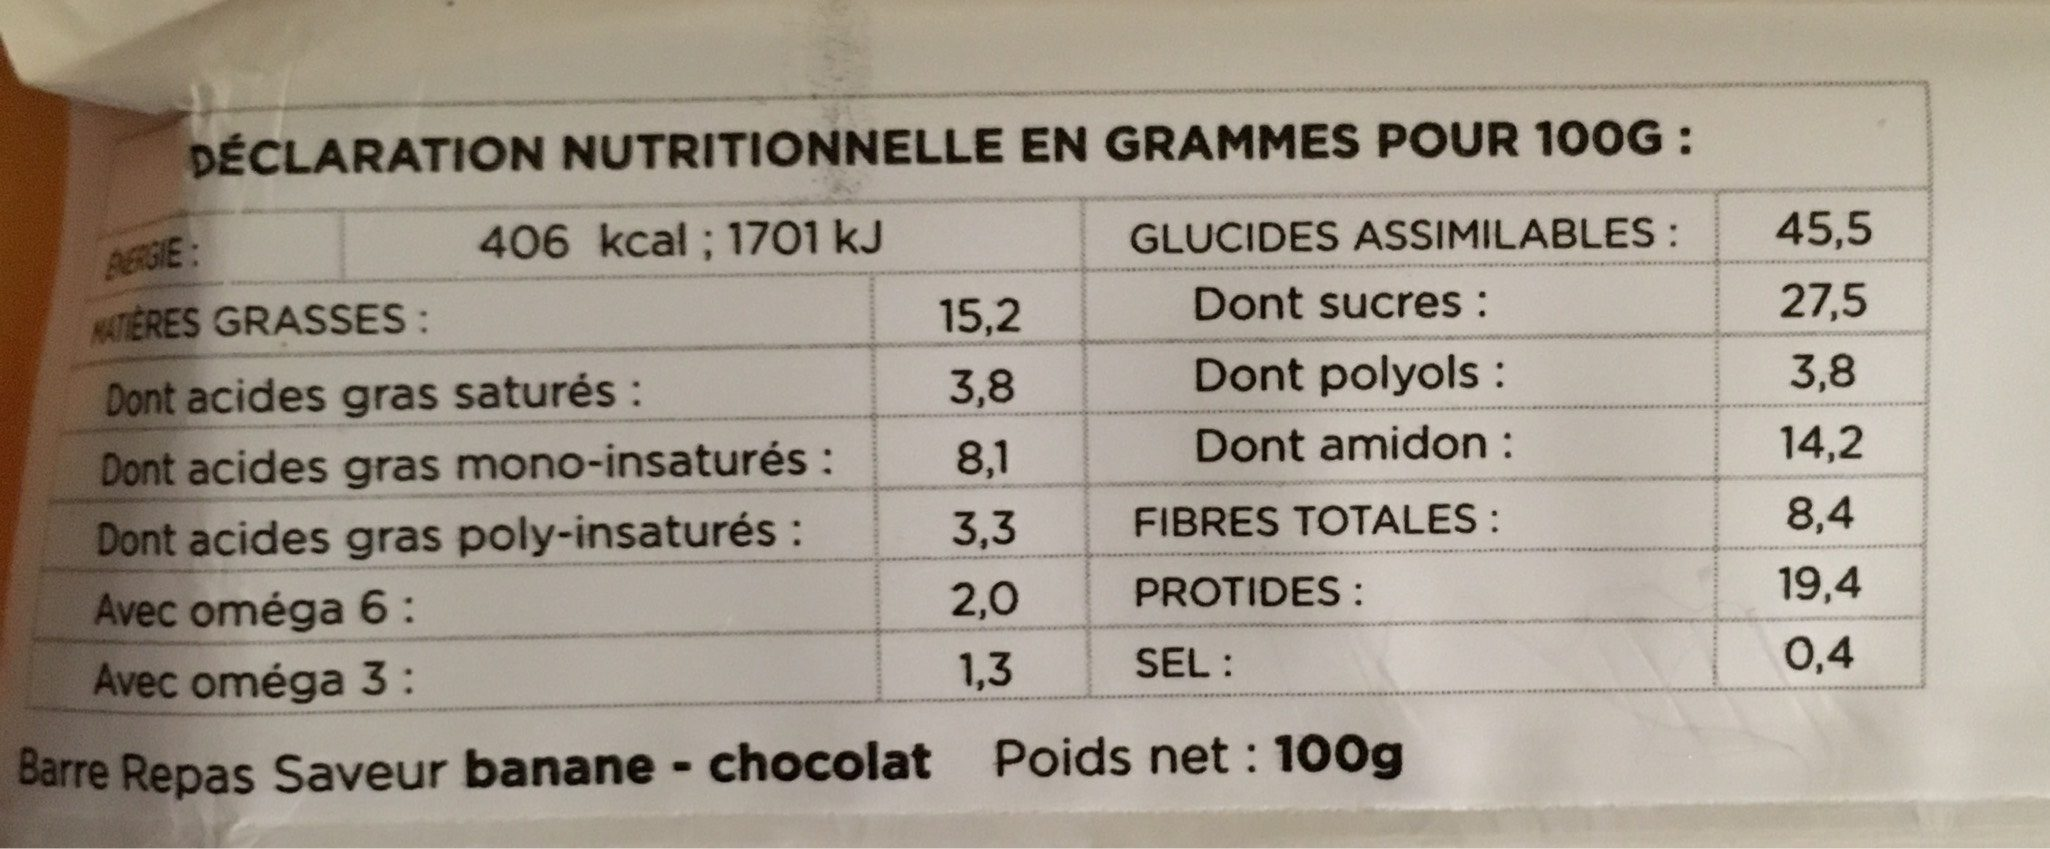 Feed barre banane chocolat - Voedingswaarden